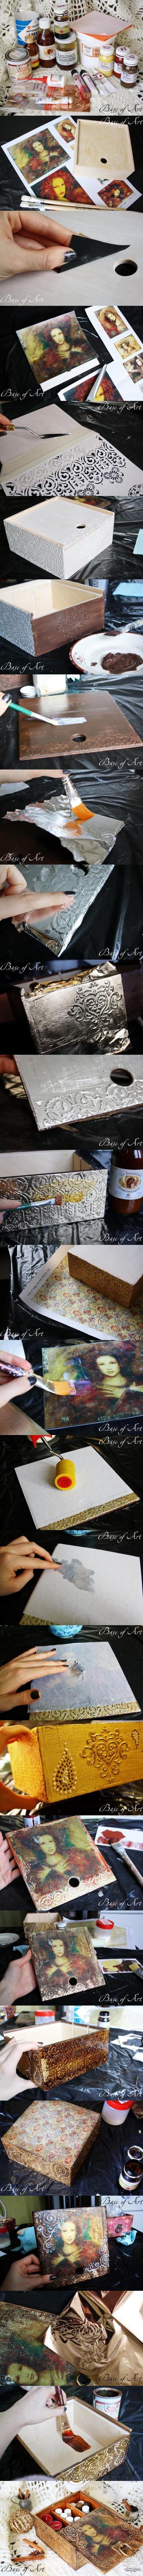 "Декупаж - Сайт любителей декупажа - DCPG.RU | Шкатулка ""Сирена"". Мастер-класс от ""Base of Art"". Click on photo to see more! Нажмите на фото чтобы увидеть больше! decoupage art craft  handmade home decor DIY do it yourself tutorial Materials and techniques: wax varnish acrylic paint etc."